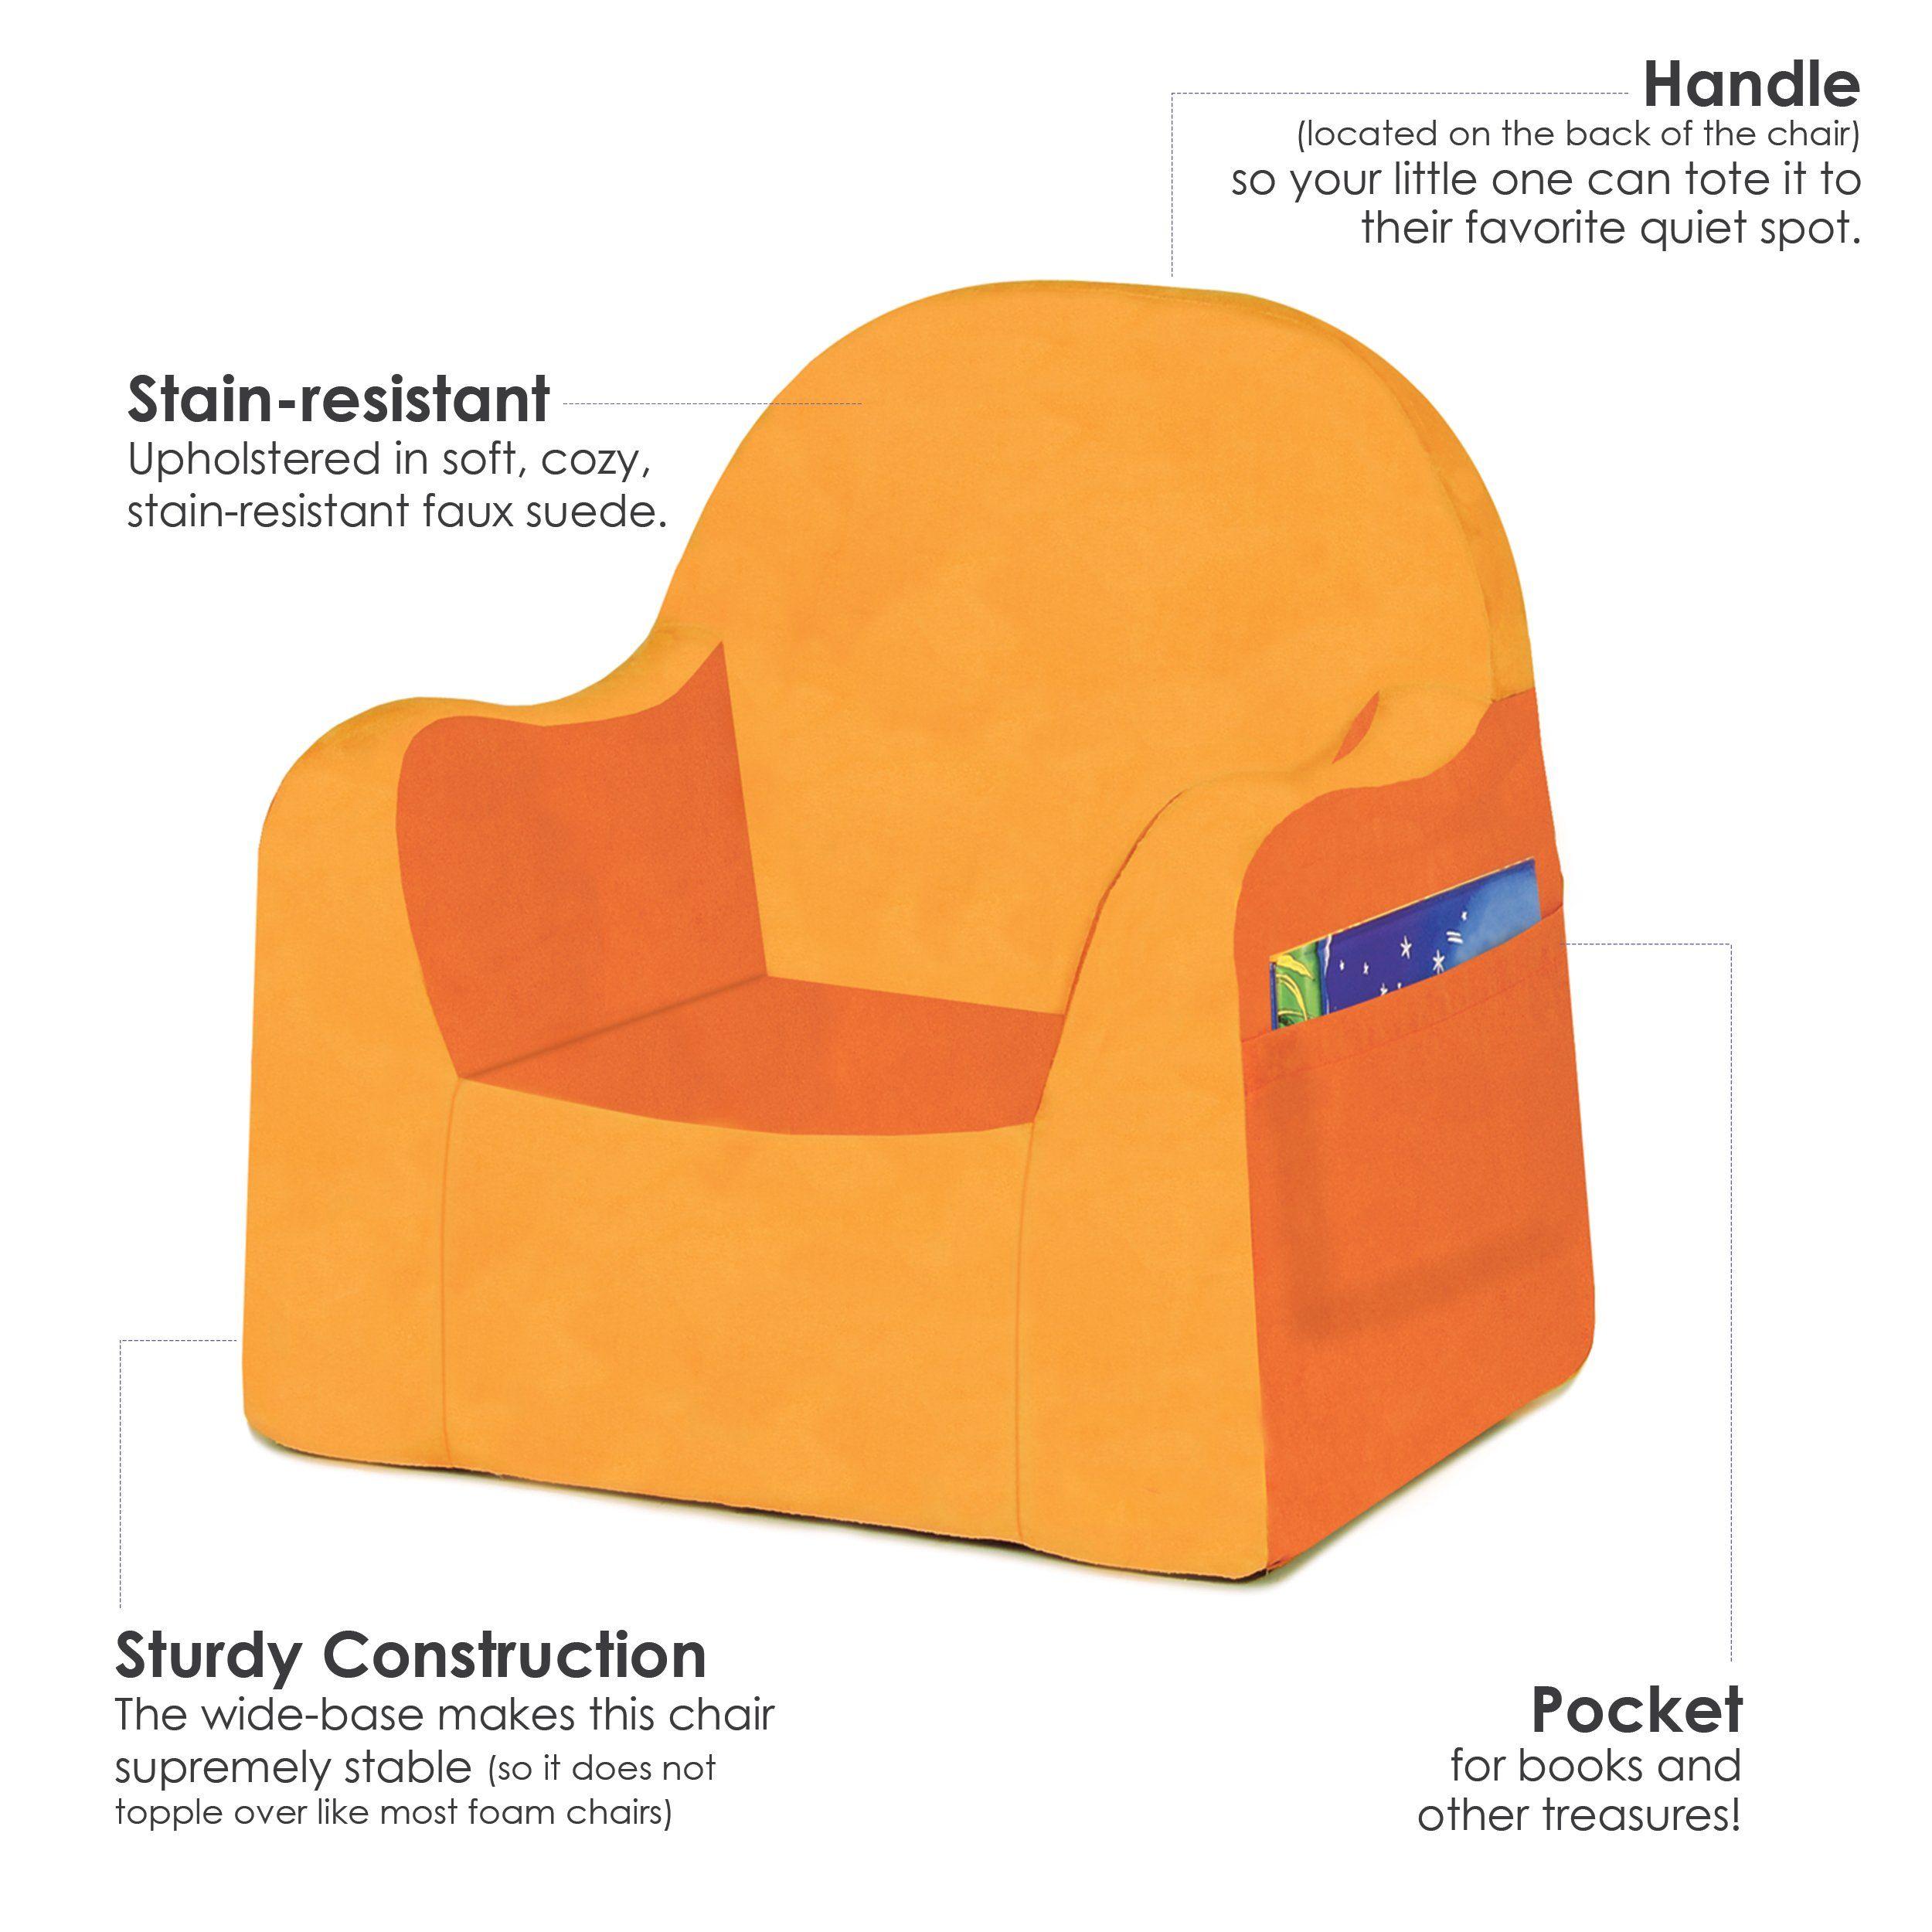 Tremendous Pkolino Little Reader Chair Orange Continue To The Product Download Free Architecture Designs Sospemadebymaigaardcom